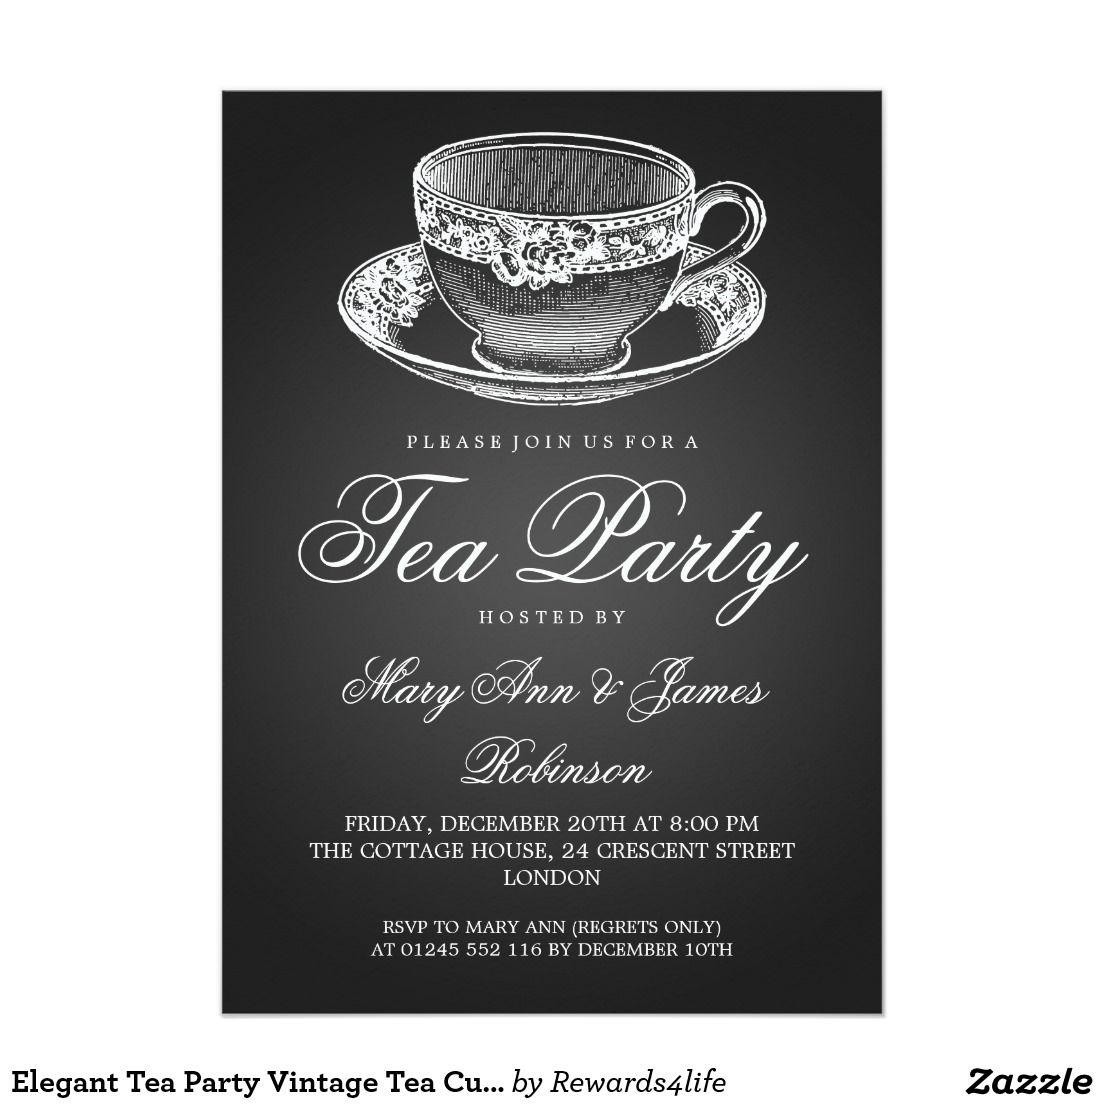 Elegant Tea Party Vintage Tea Cup Black Card Tea Party Invitations